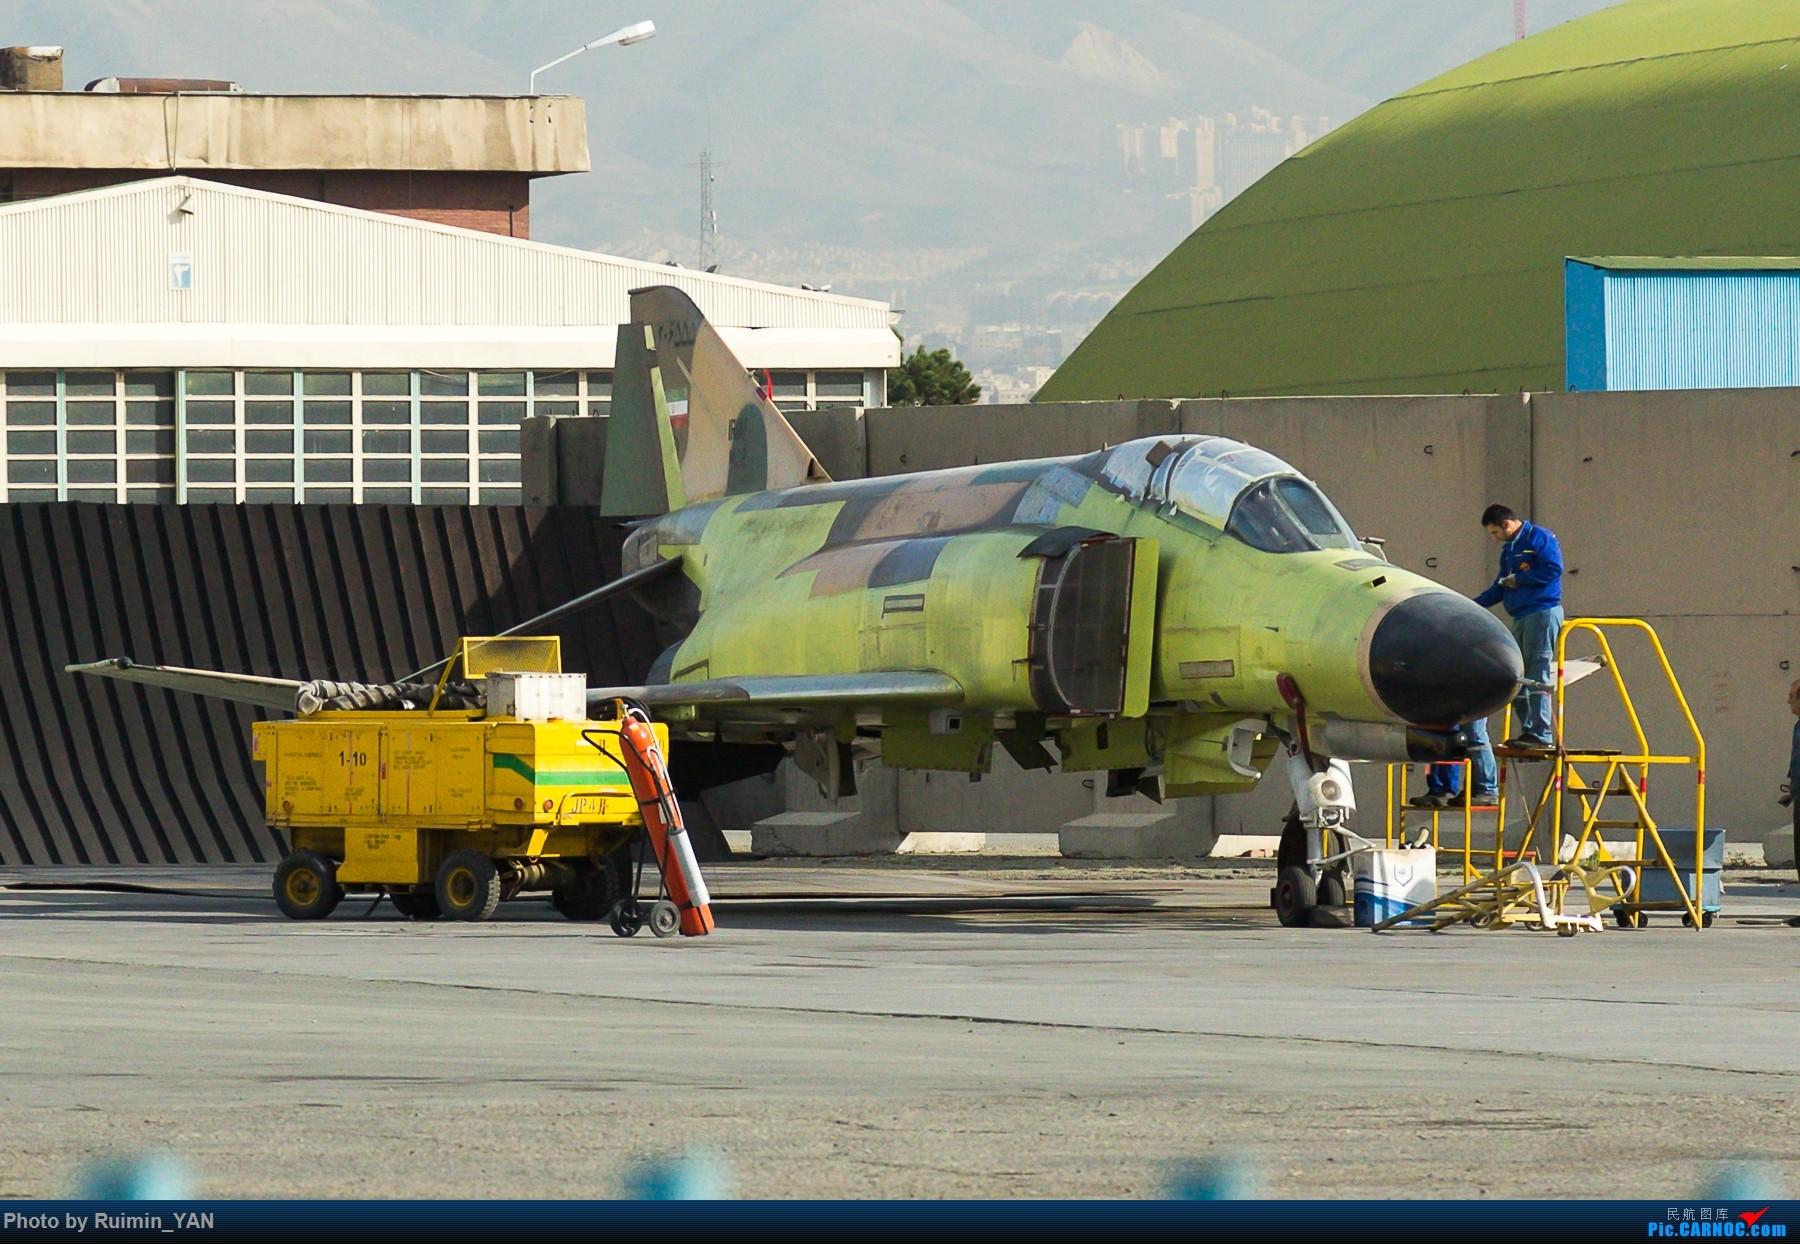 Re:[原创]【THR】(德黑兰梅赫拉巴德机场)伊朗空军(Iran Air Force)-- F-14A(Tomcat雄猫),Su-22M-4,F-4(鬼怪Phantom) F-4 3-6555 伊朗德黑兰机场